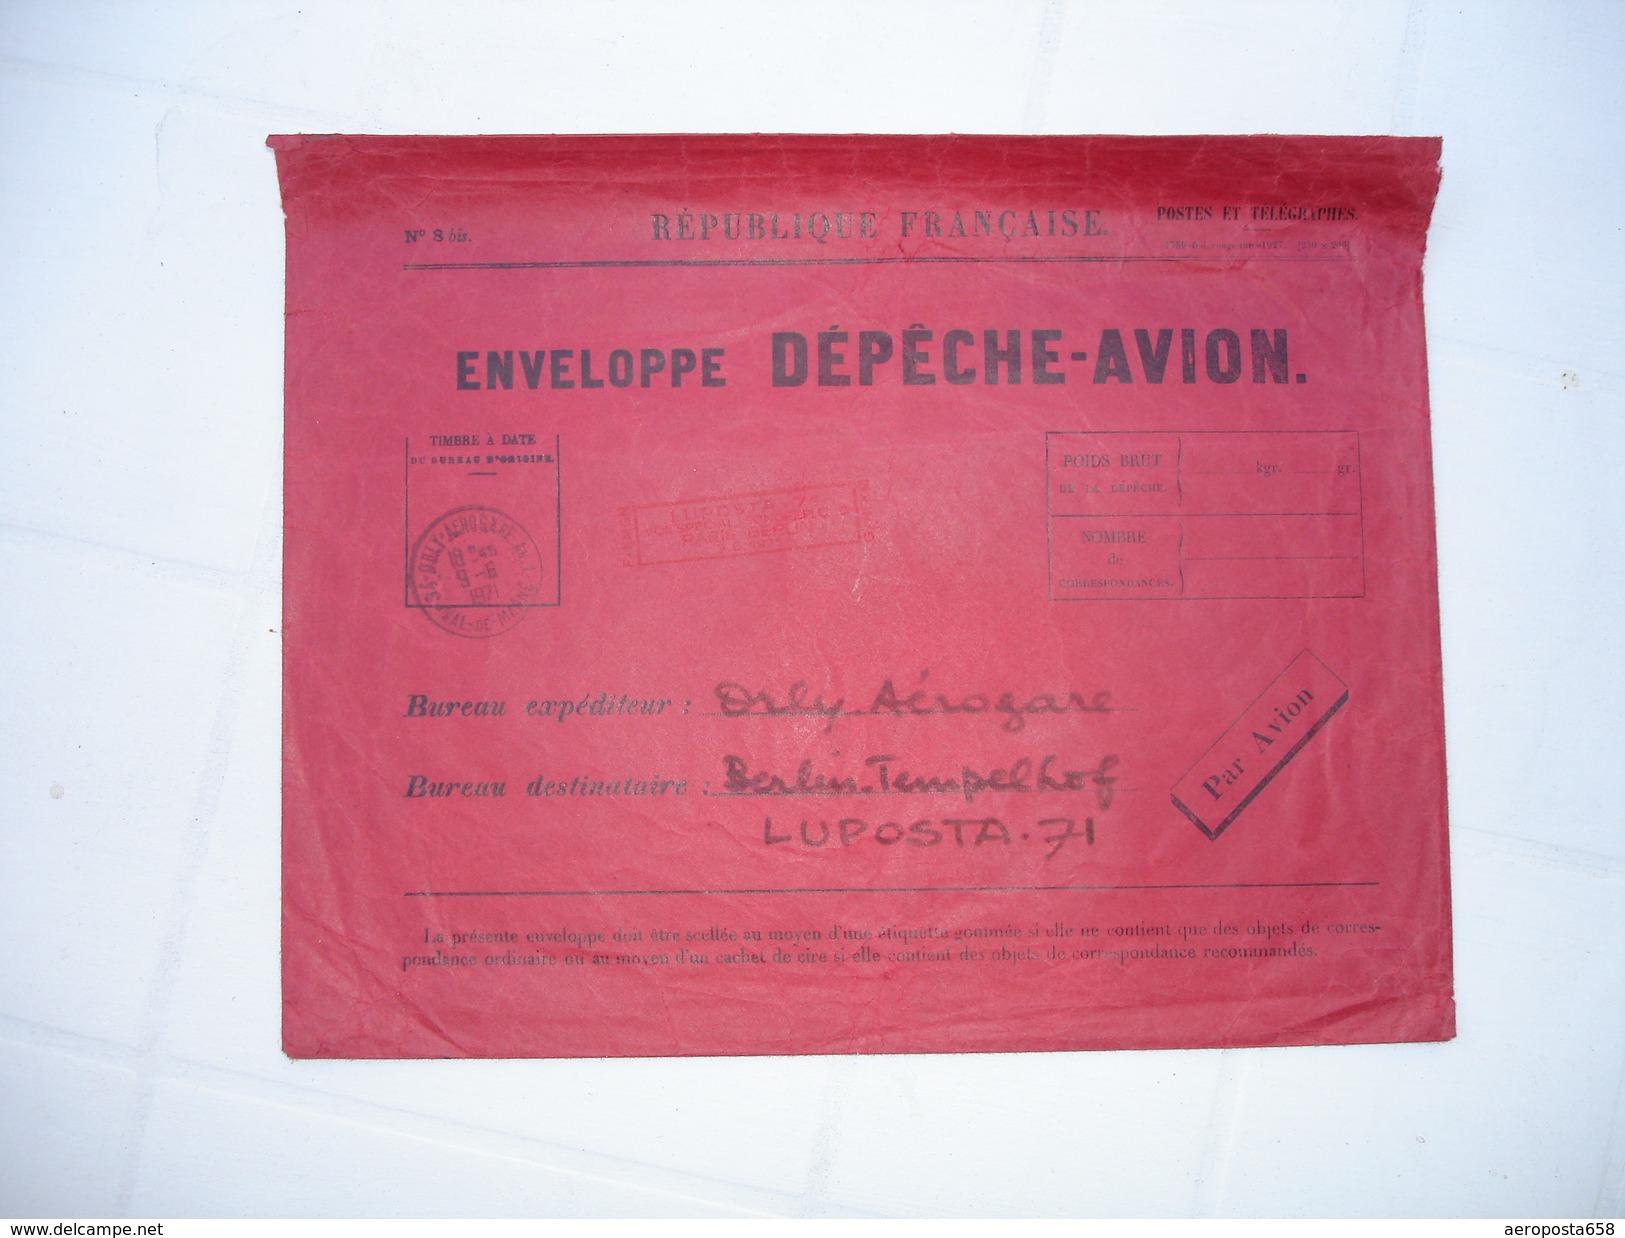 Enveloppe Dépèche-avion - Kommerzielle Luftfahrt